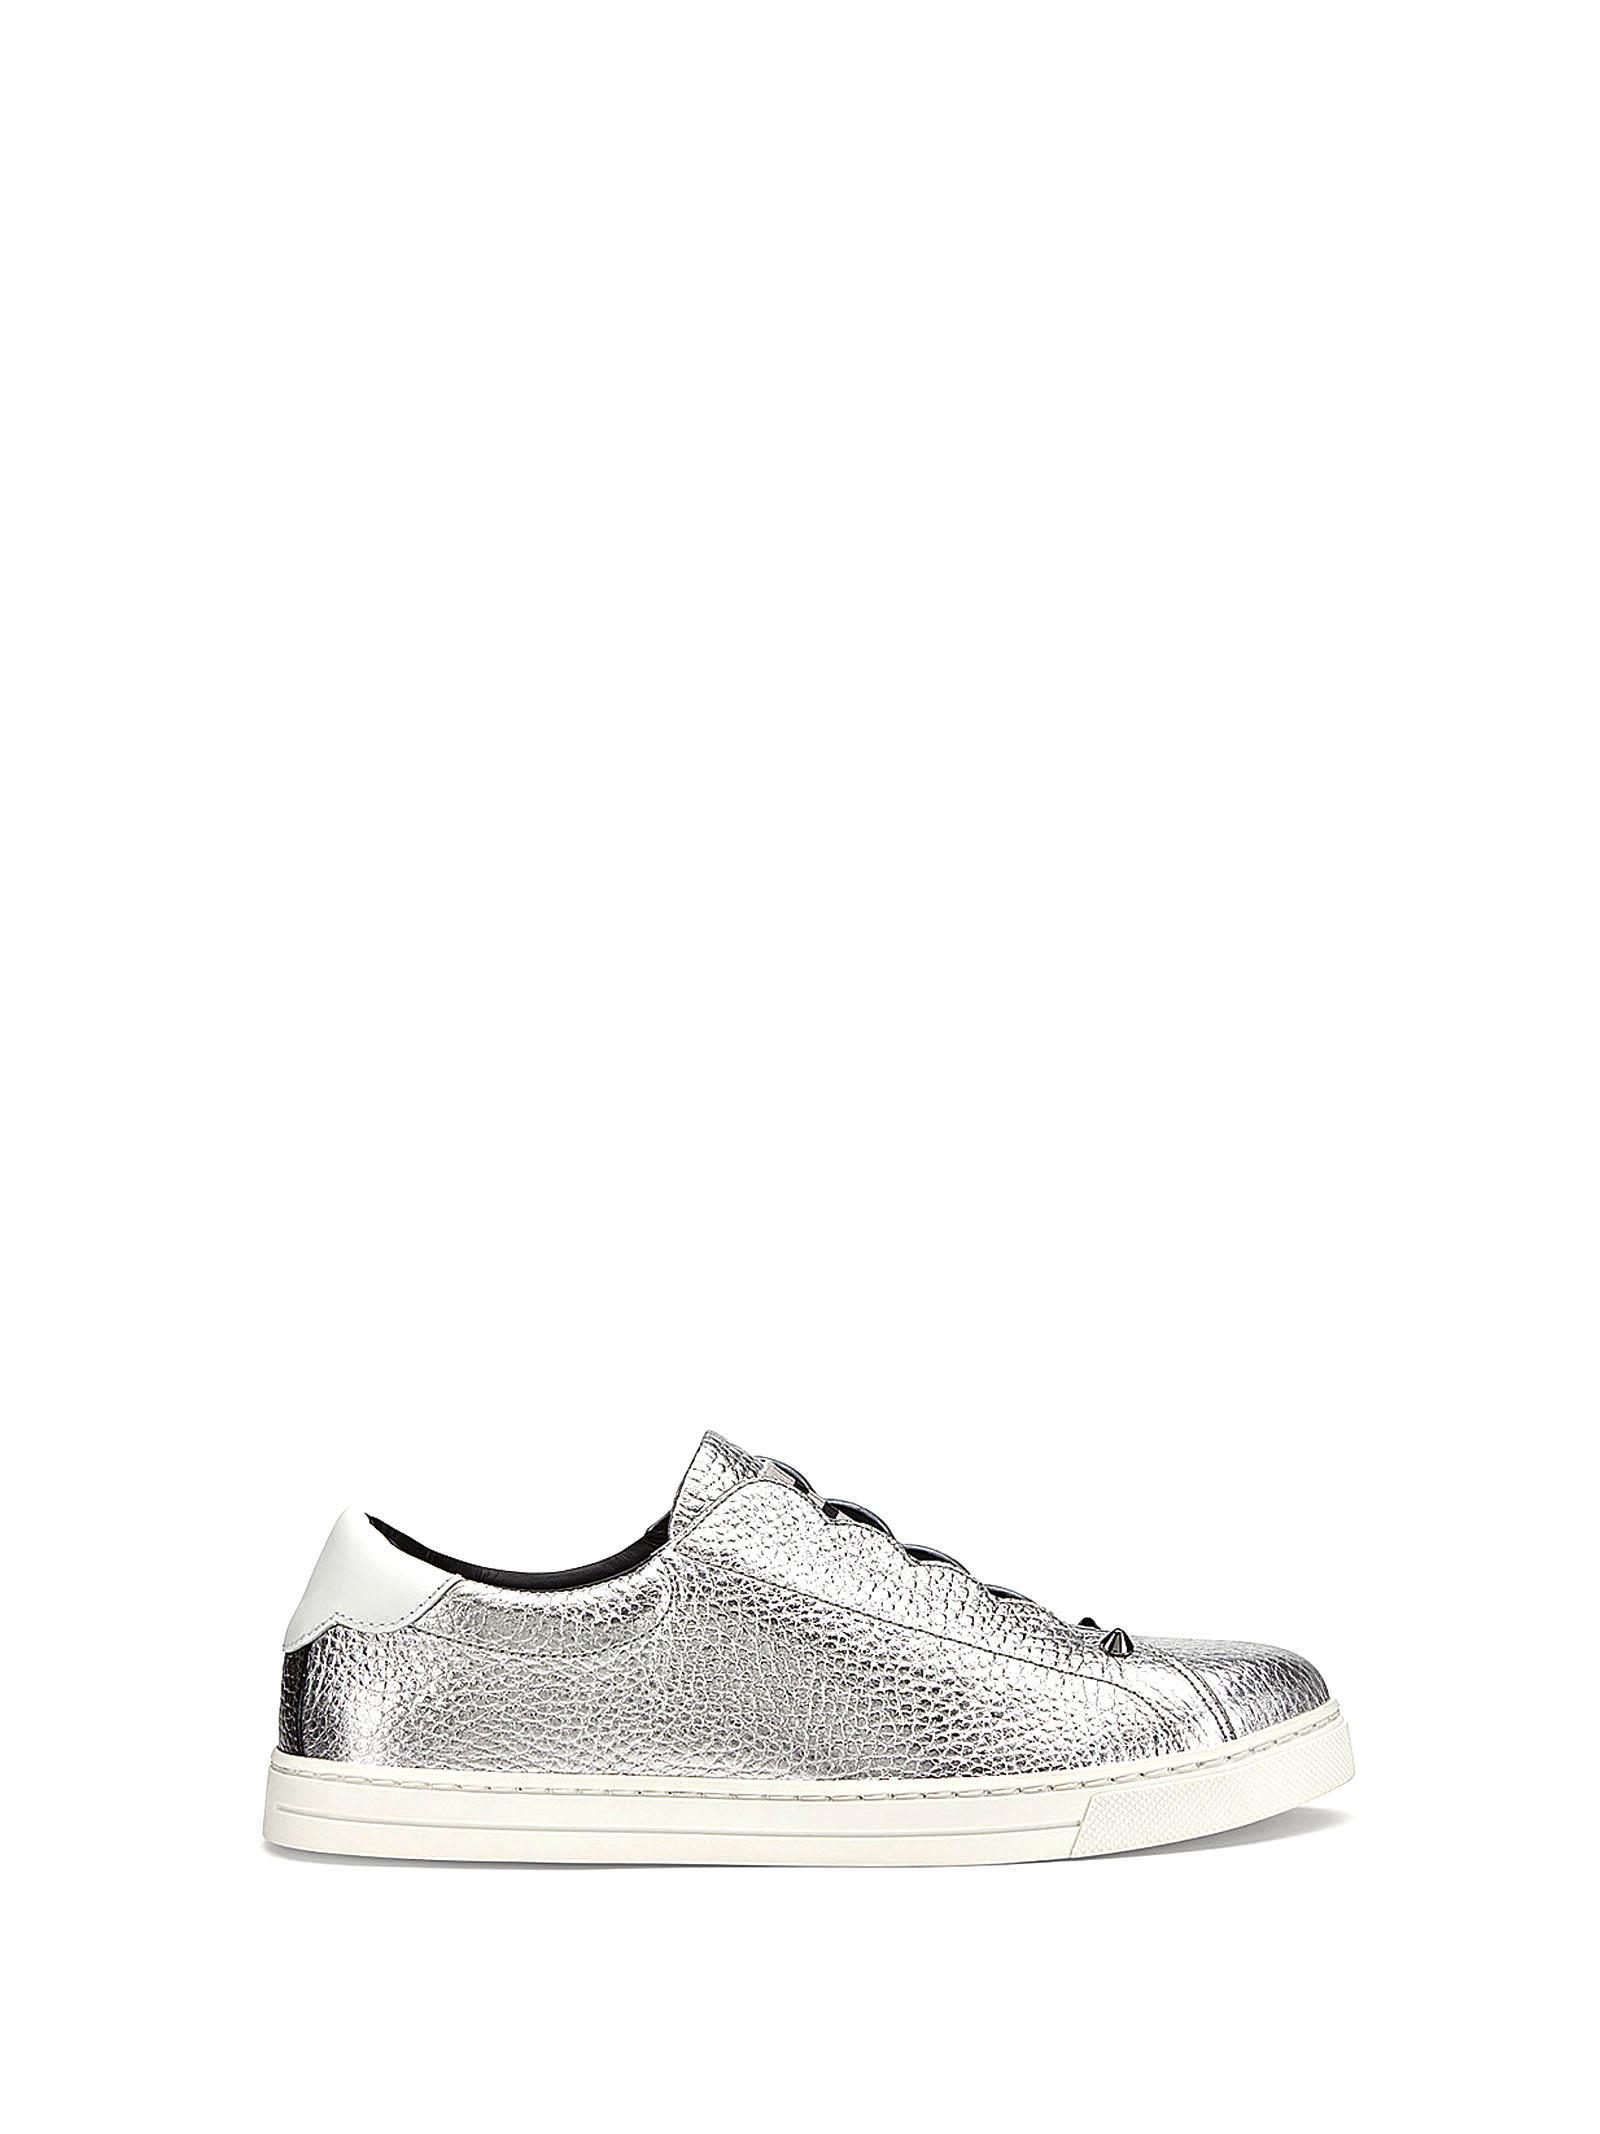 Fendi Slip On In Silver Calf Leather